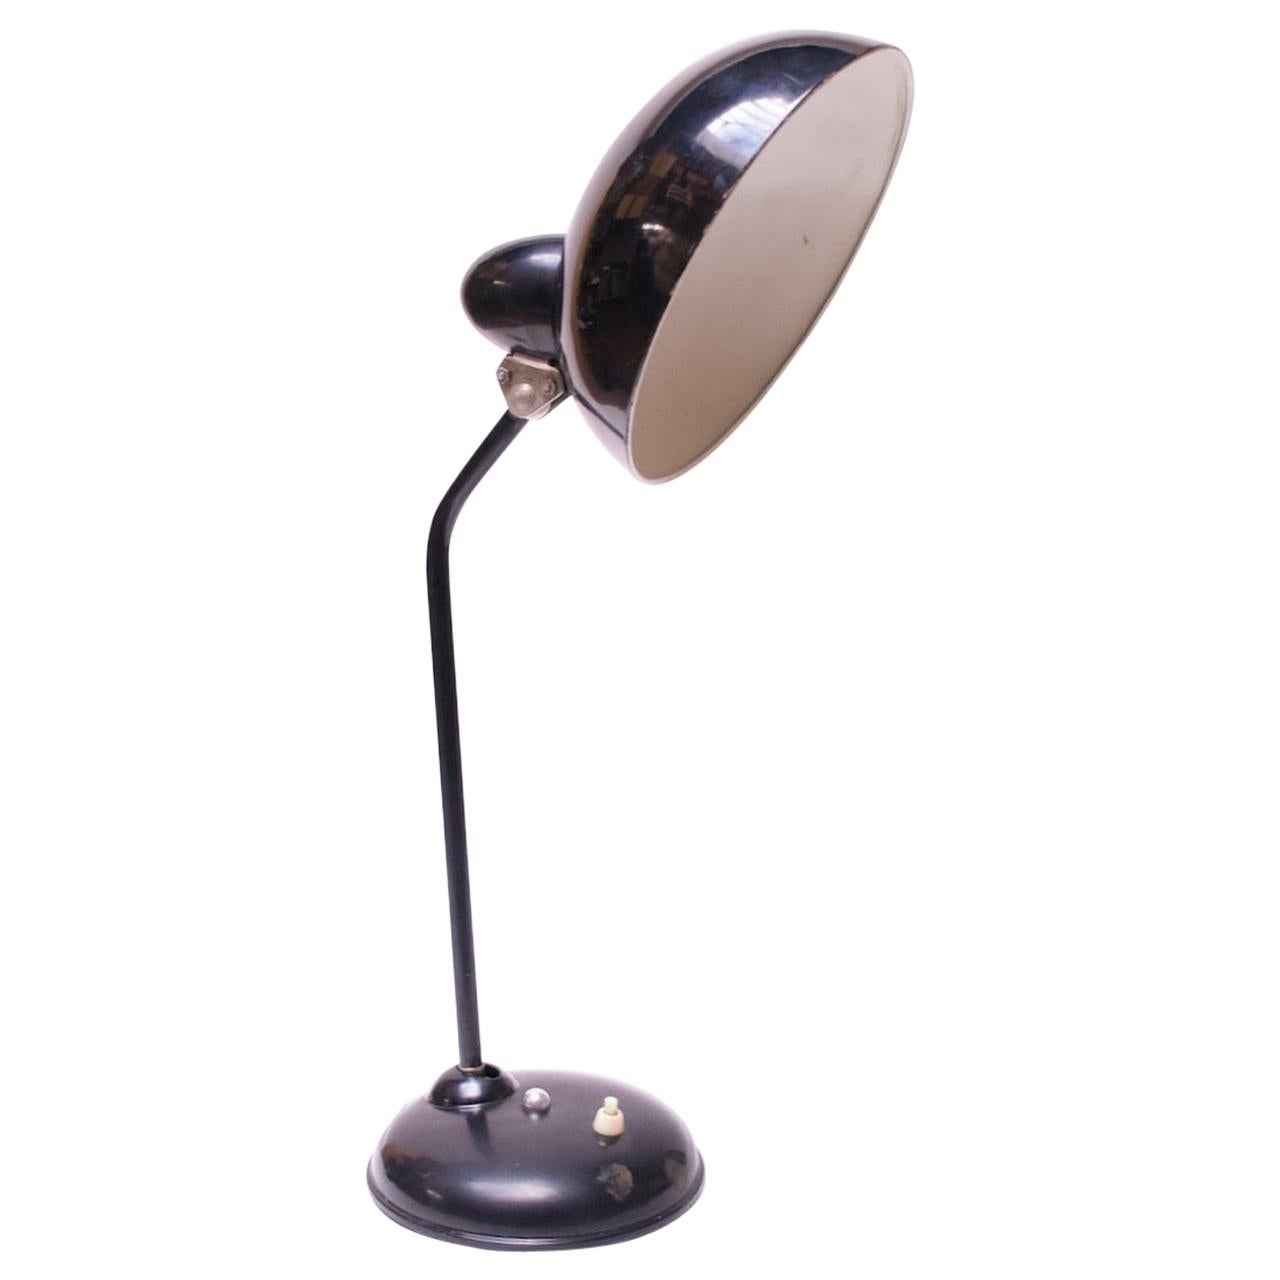 Vintage Bauhaus-Style Painted Metal Adjustable Table/Task Lamp